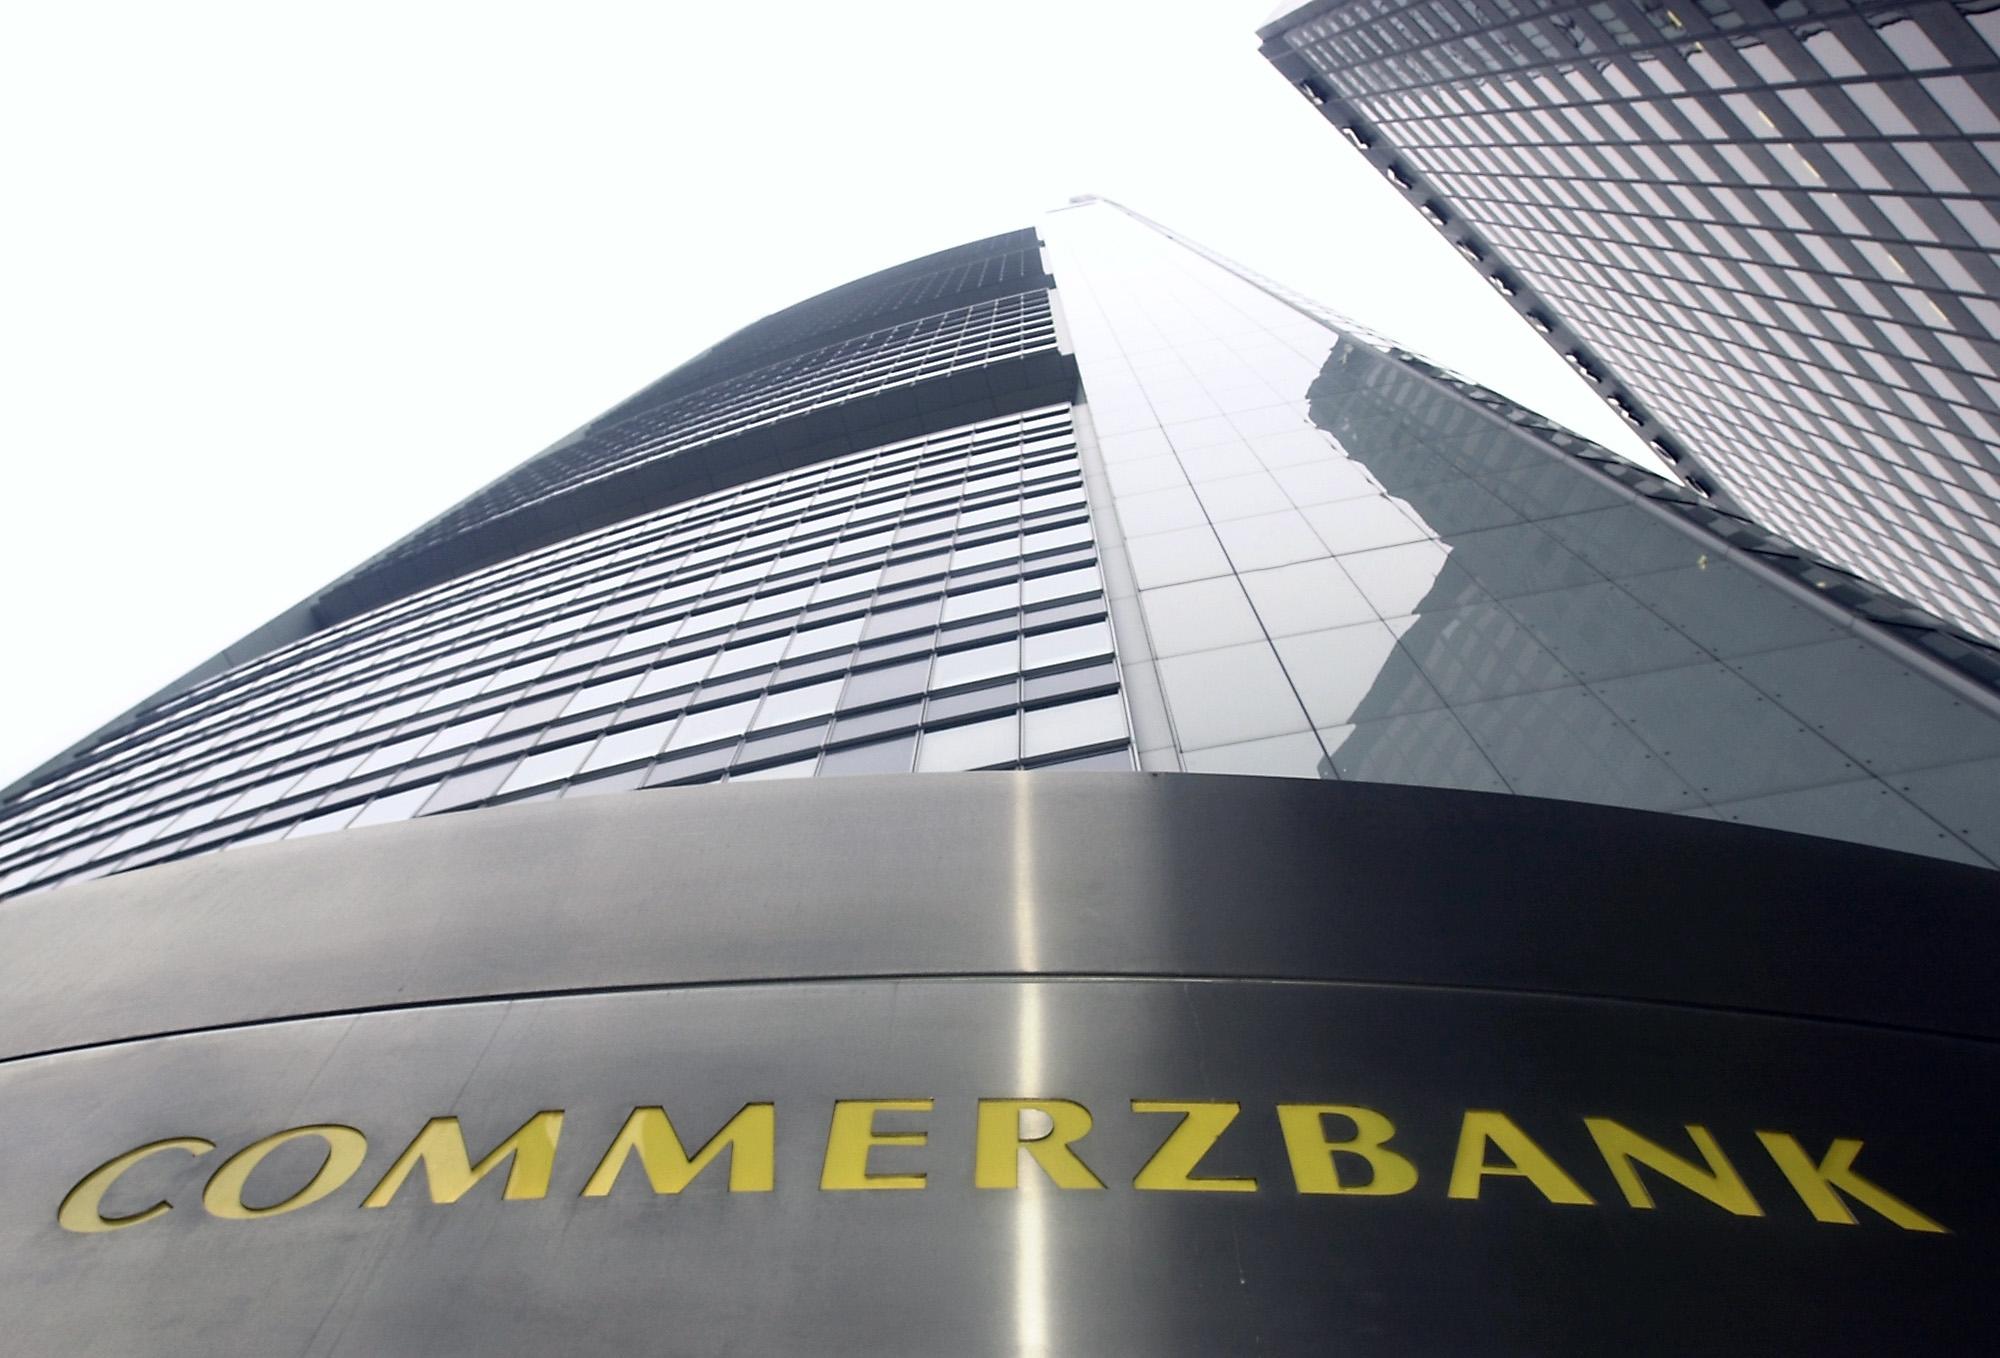 Bloomberg commerzbank